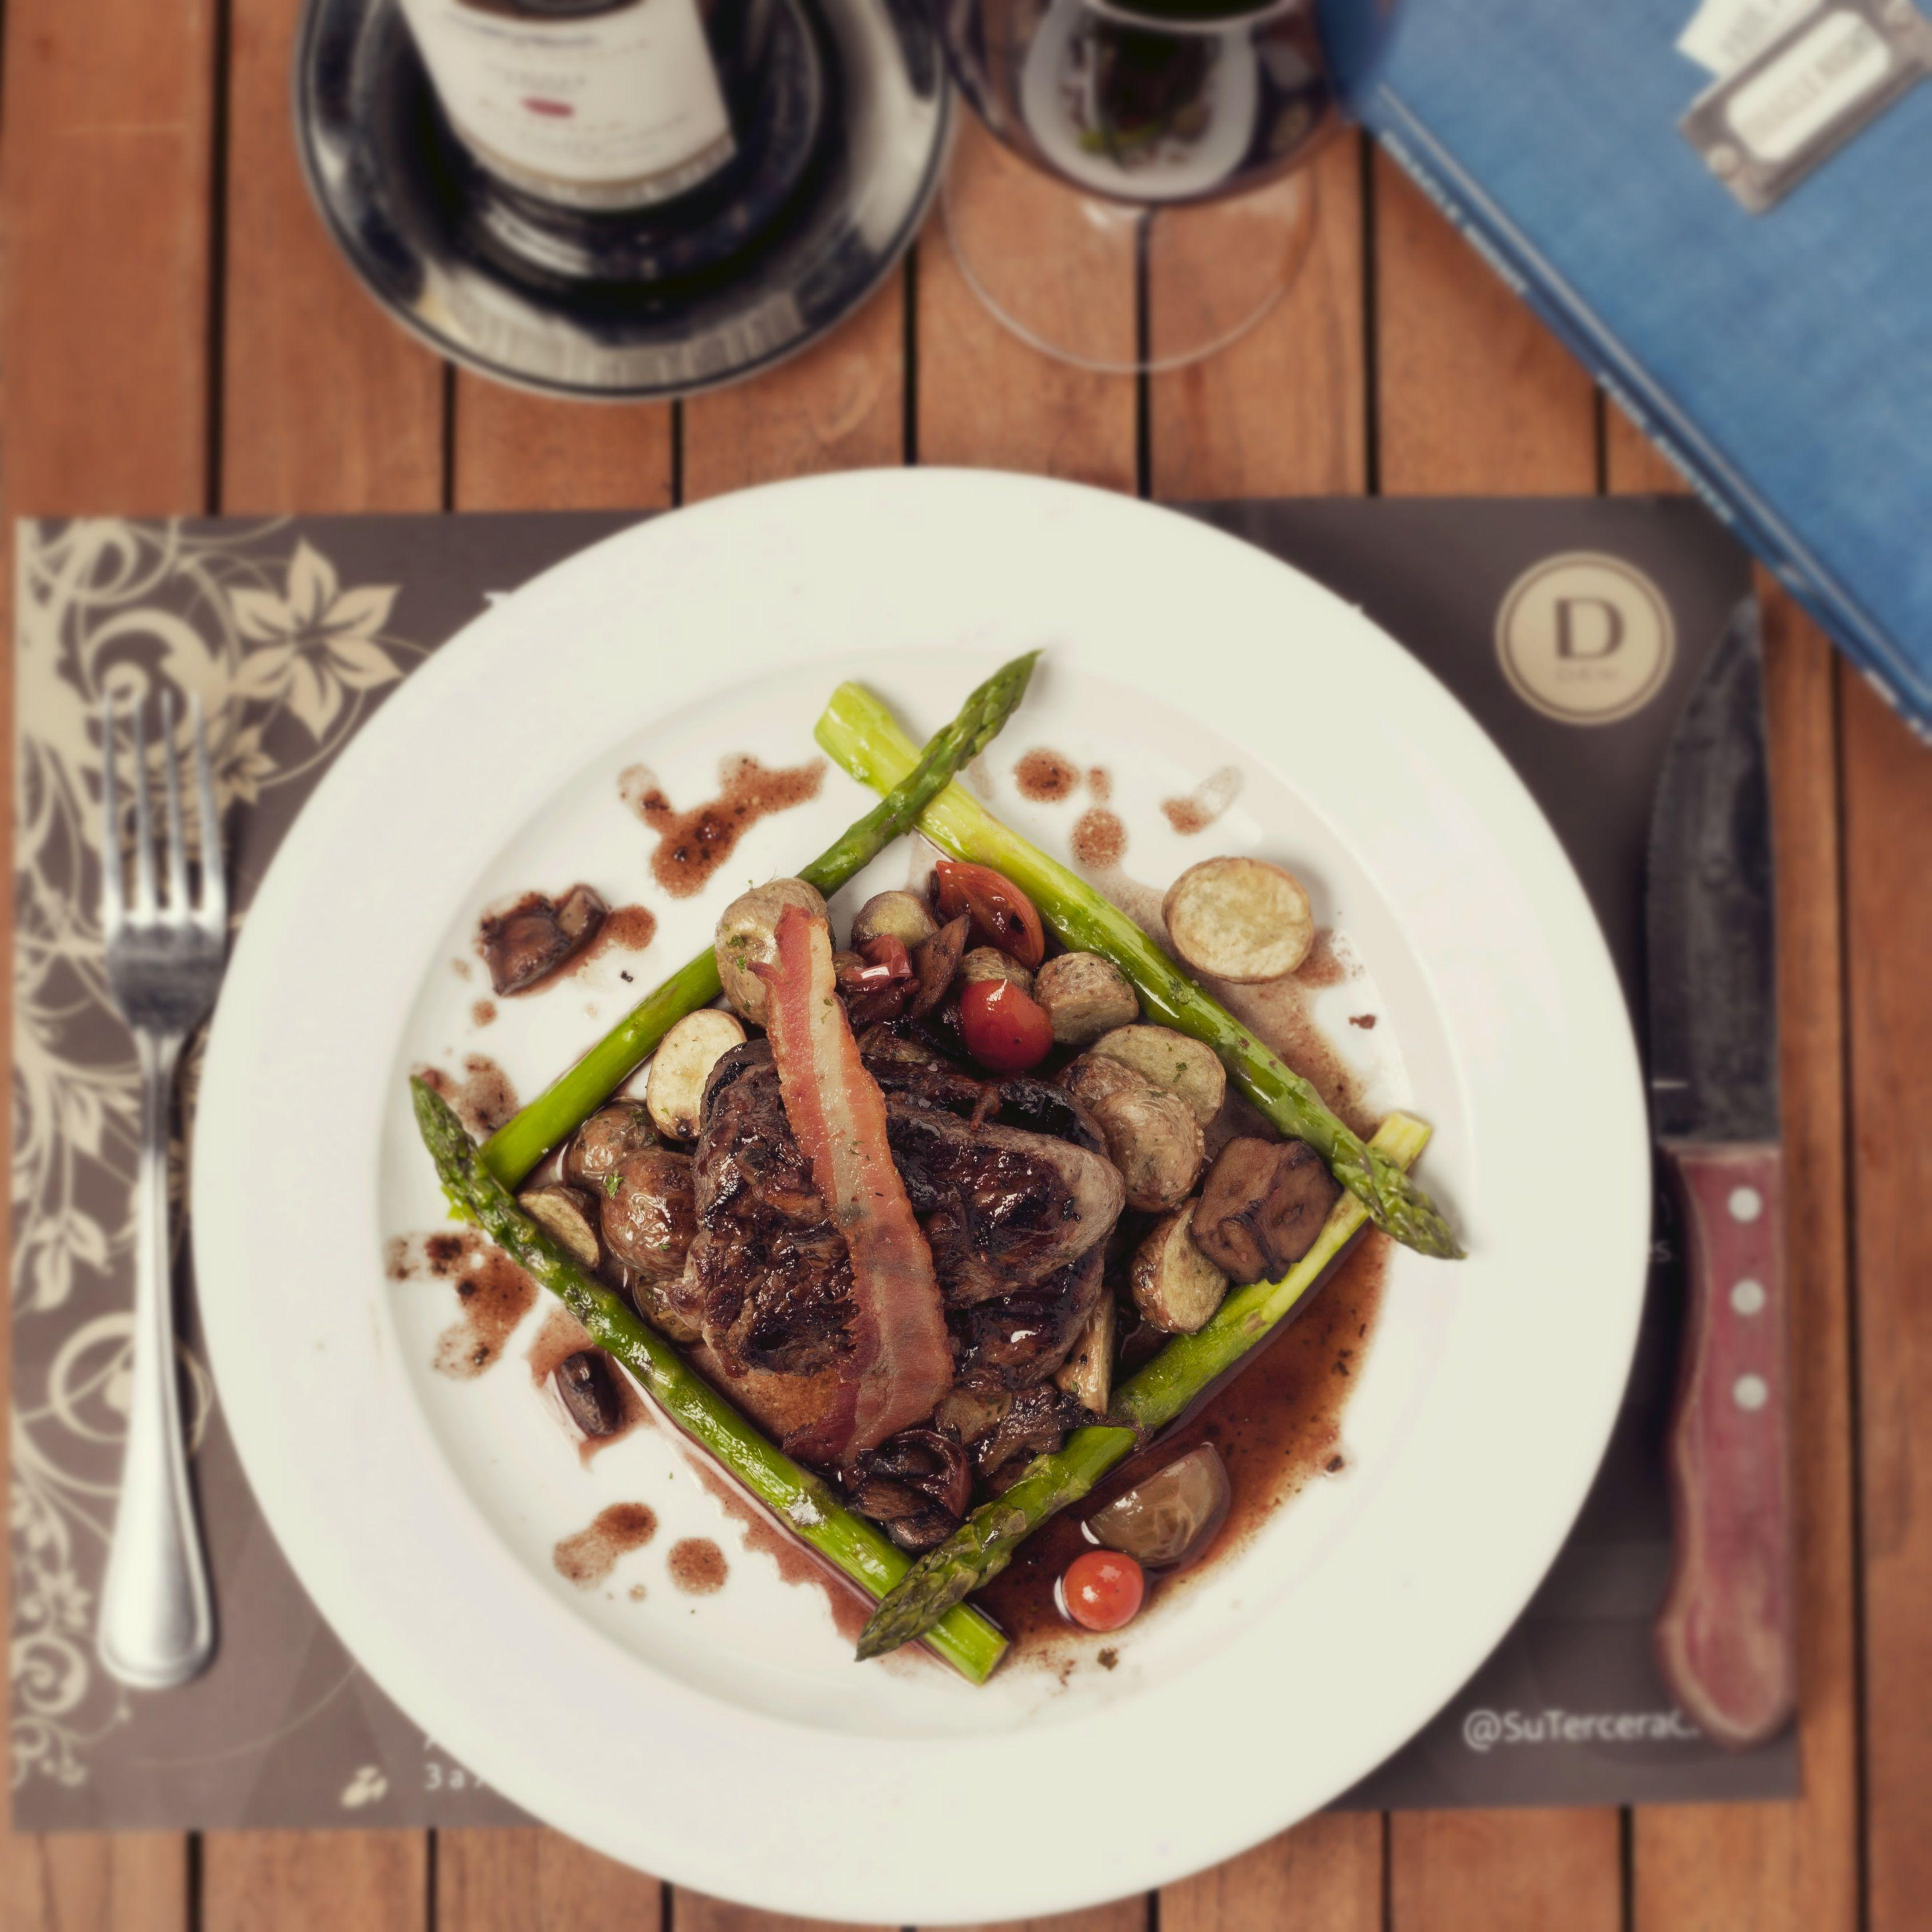 Tournedos Chasseur #Gourmet #Food #SuTerceraCasa